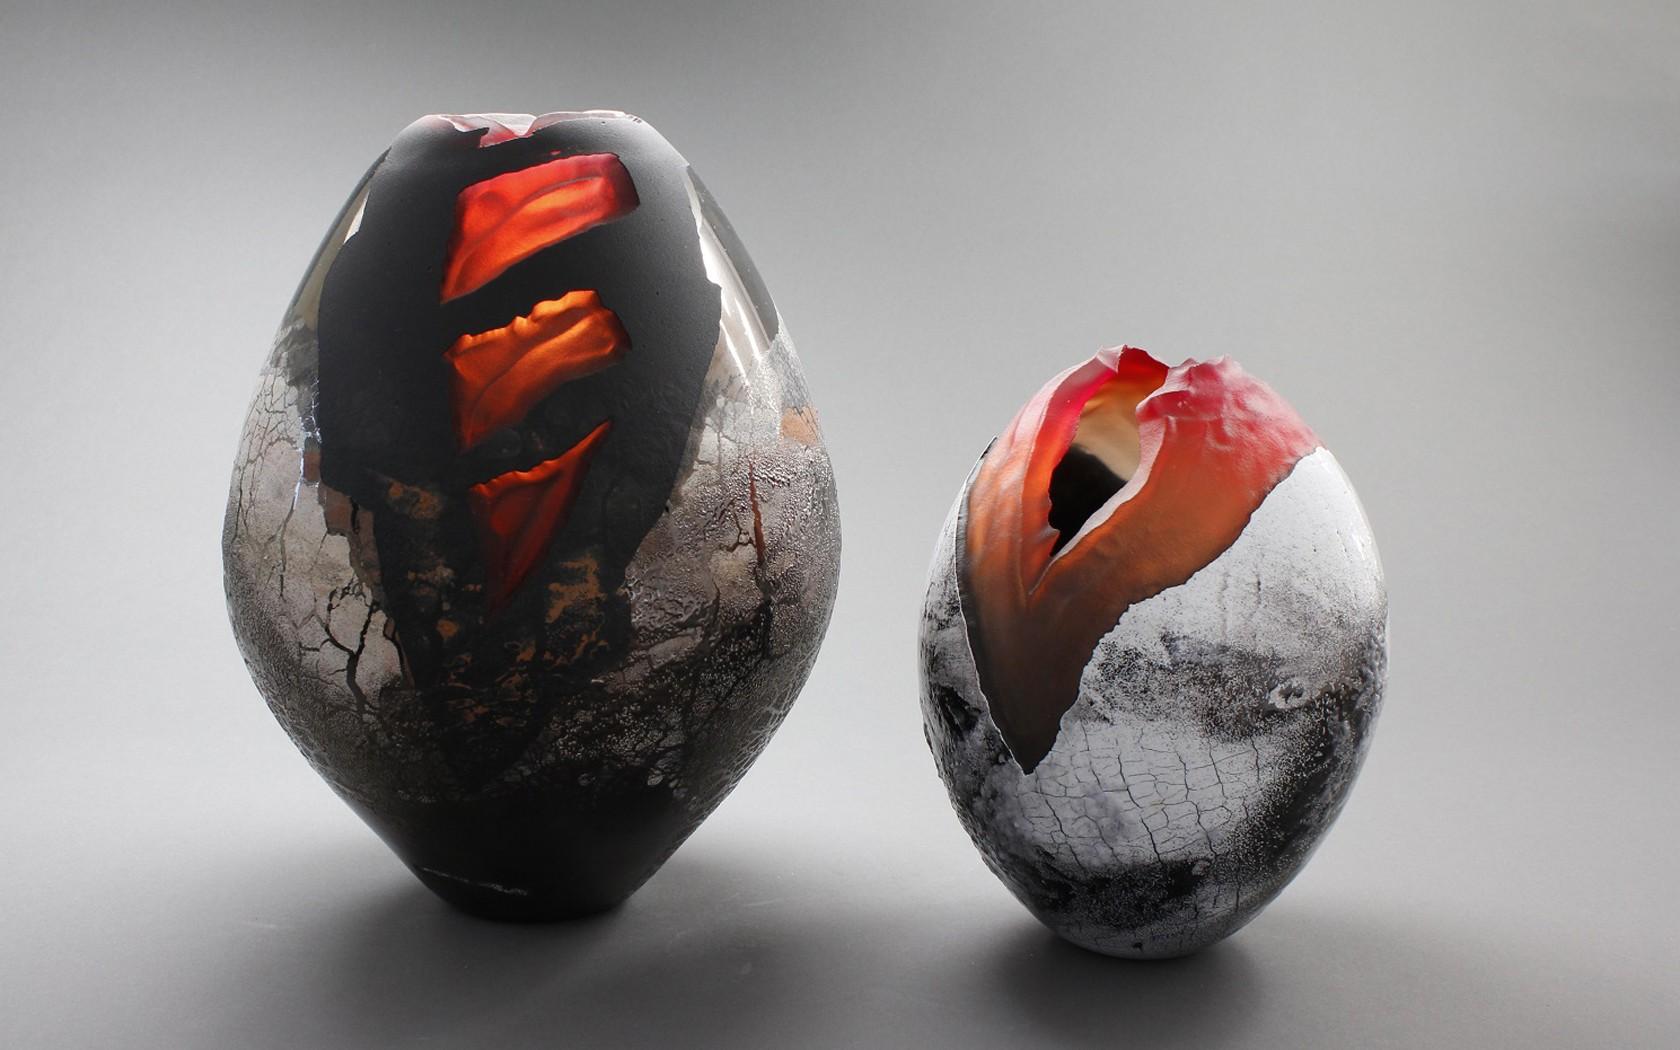 Objekte von Pascal Lemoine